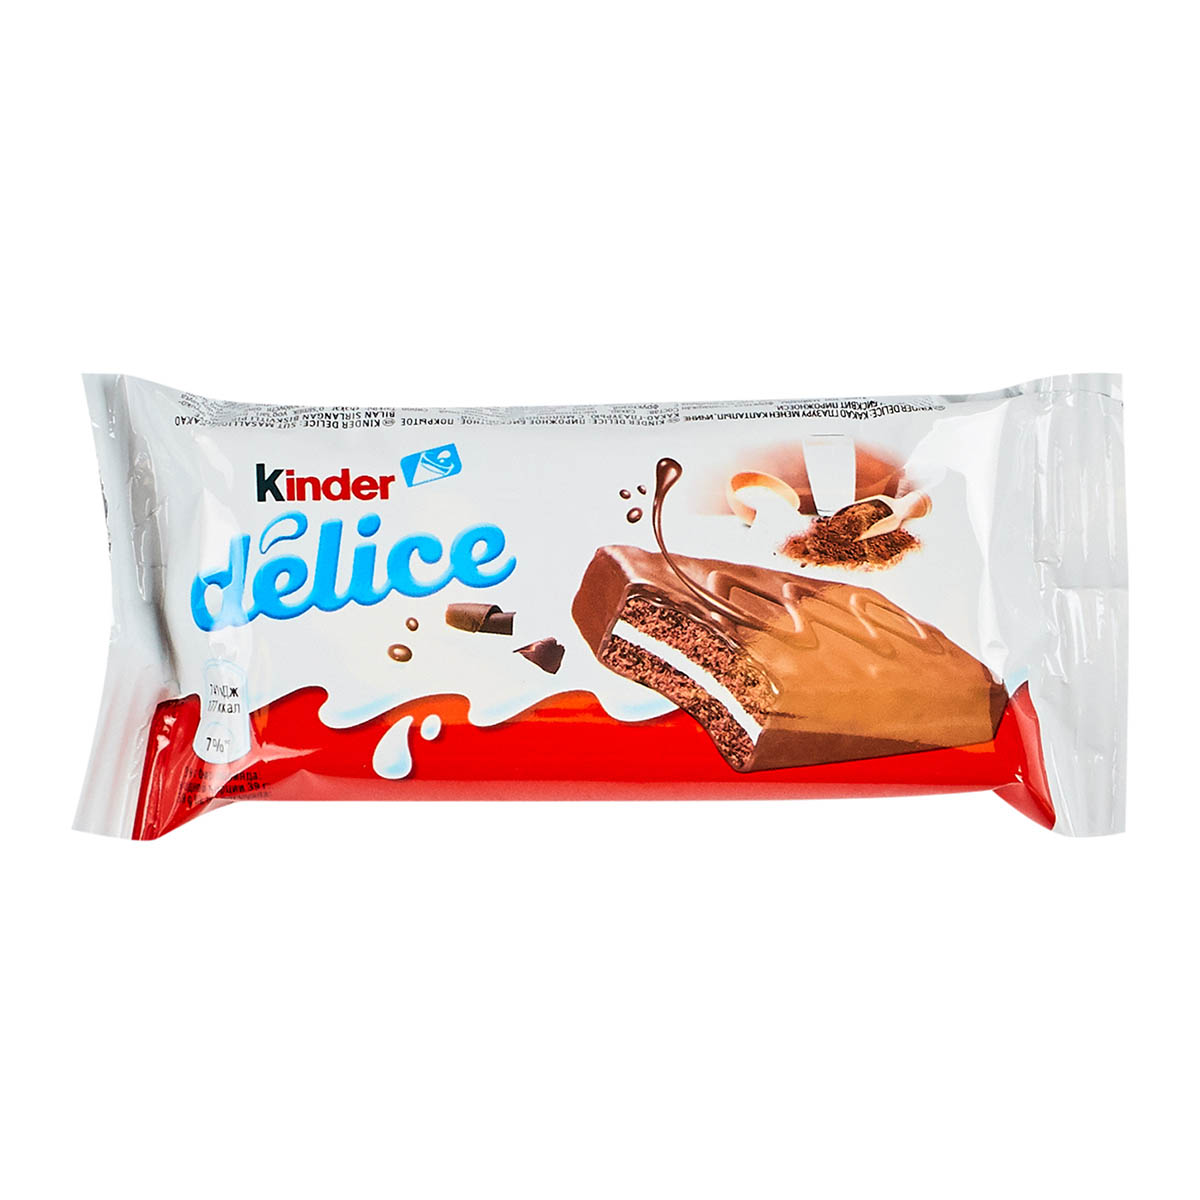 Kinder какао-глазурь